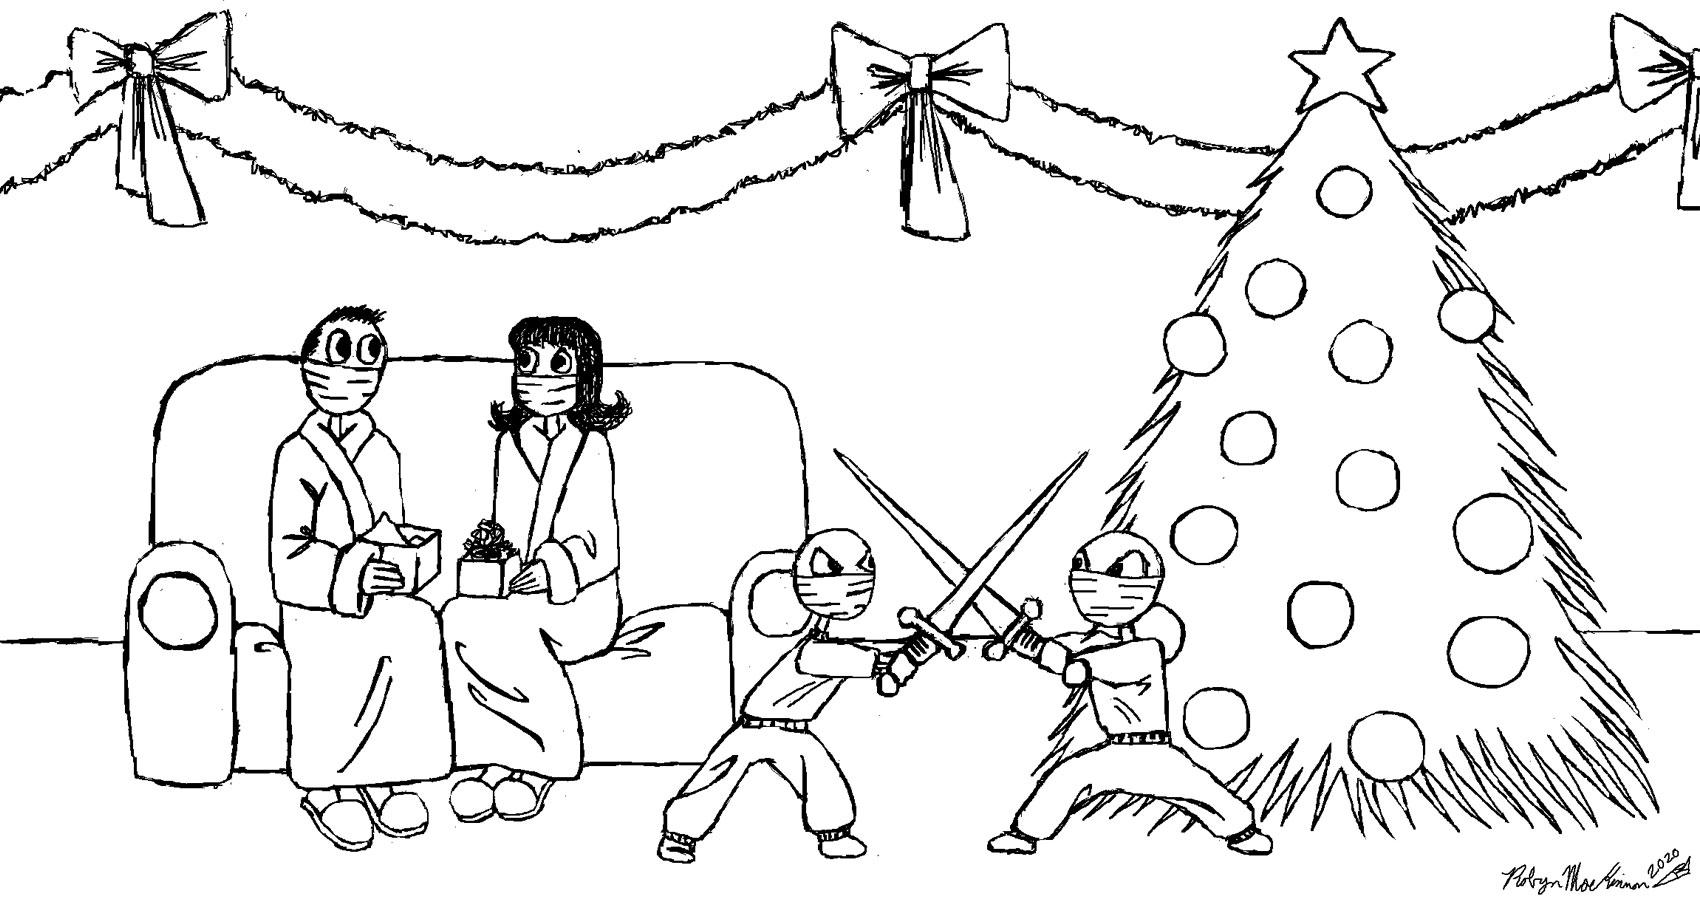 Weird Christmas, a haiku by Robyn MacKinnon at Spillwords.com